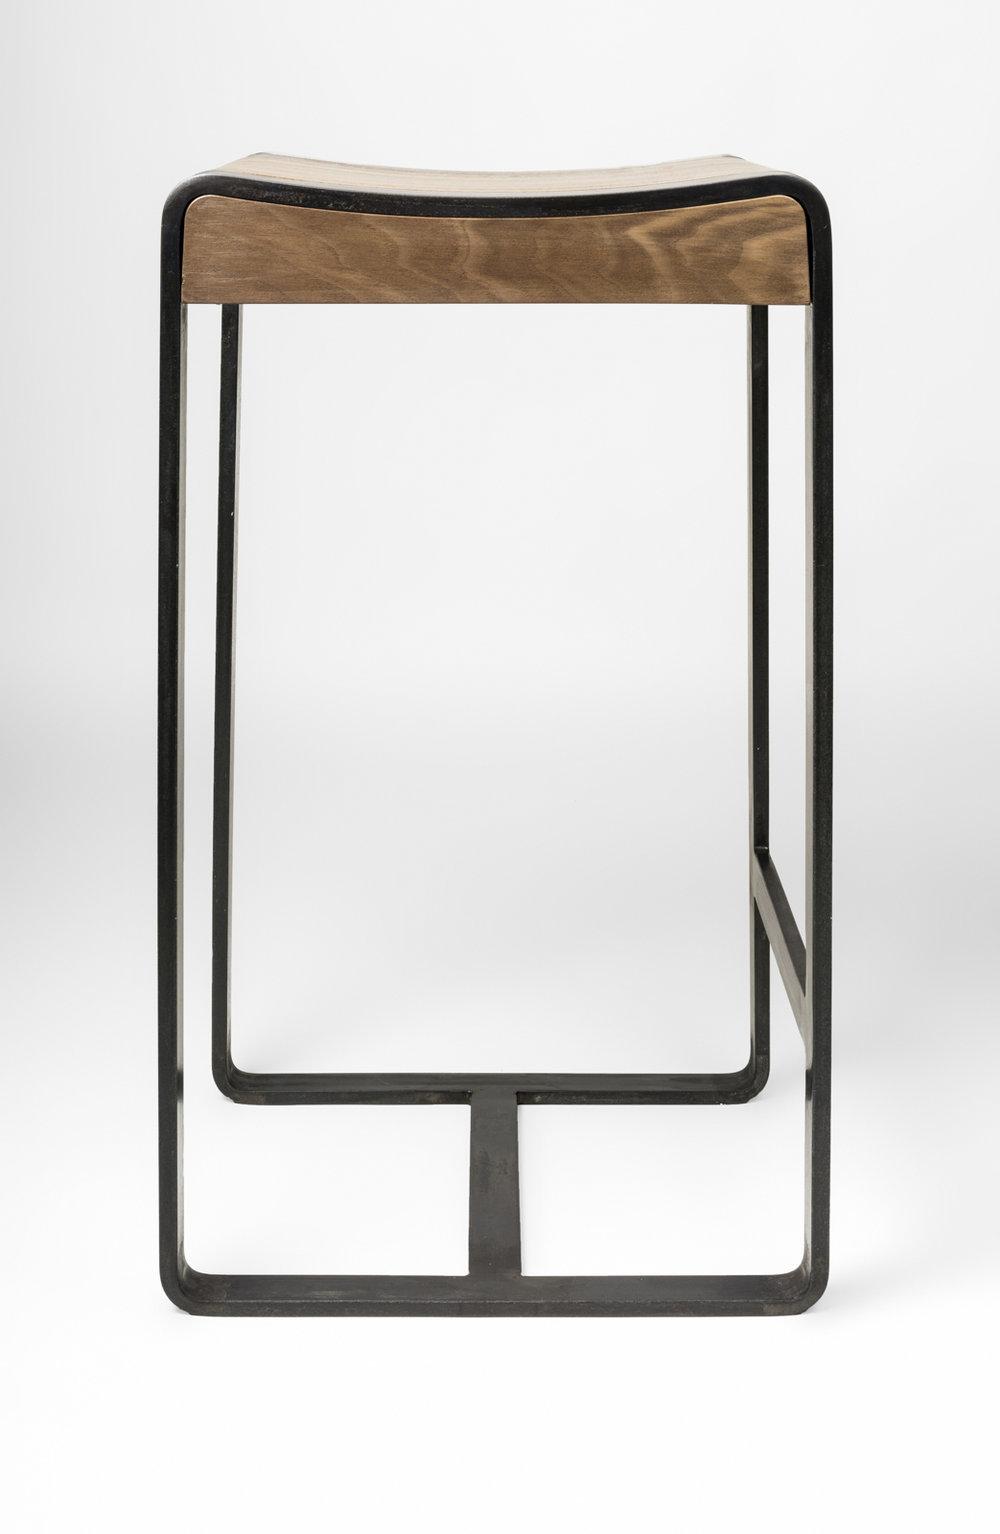 stool_03.jpg